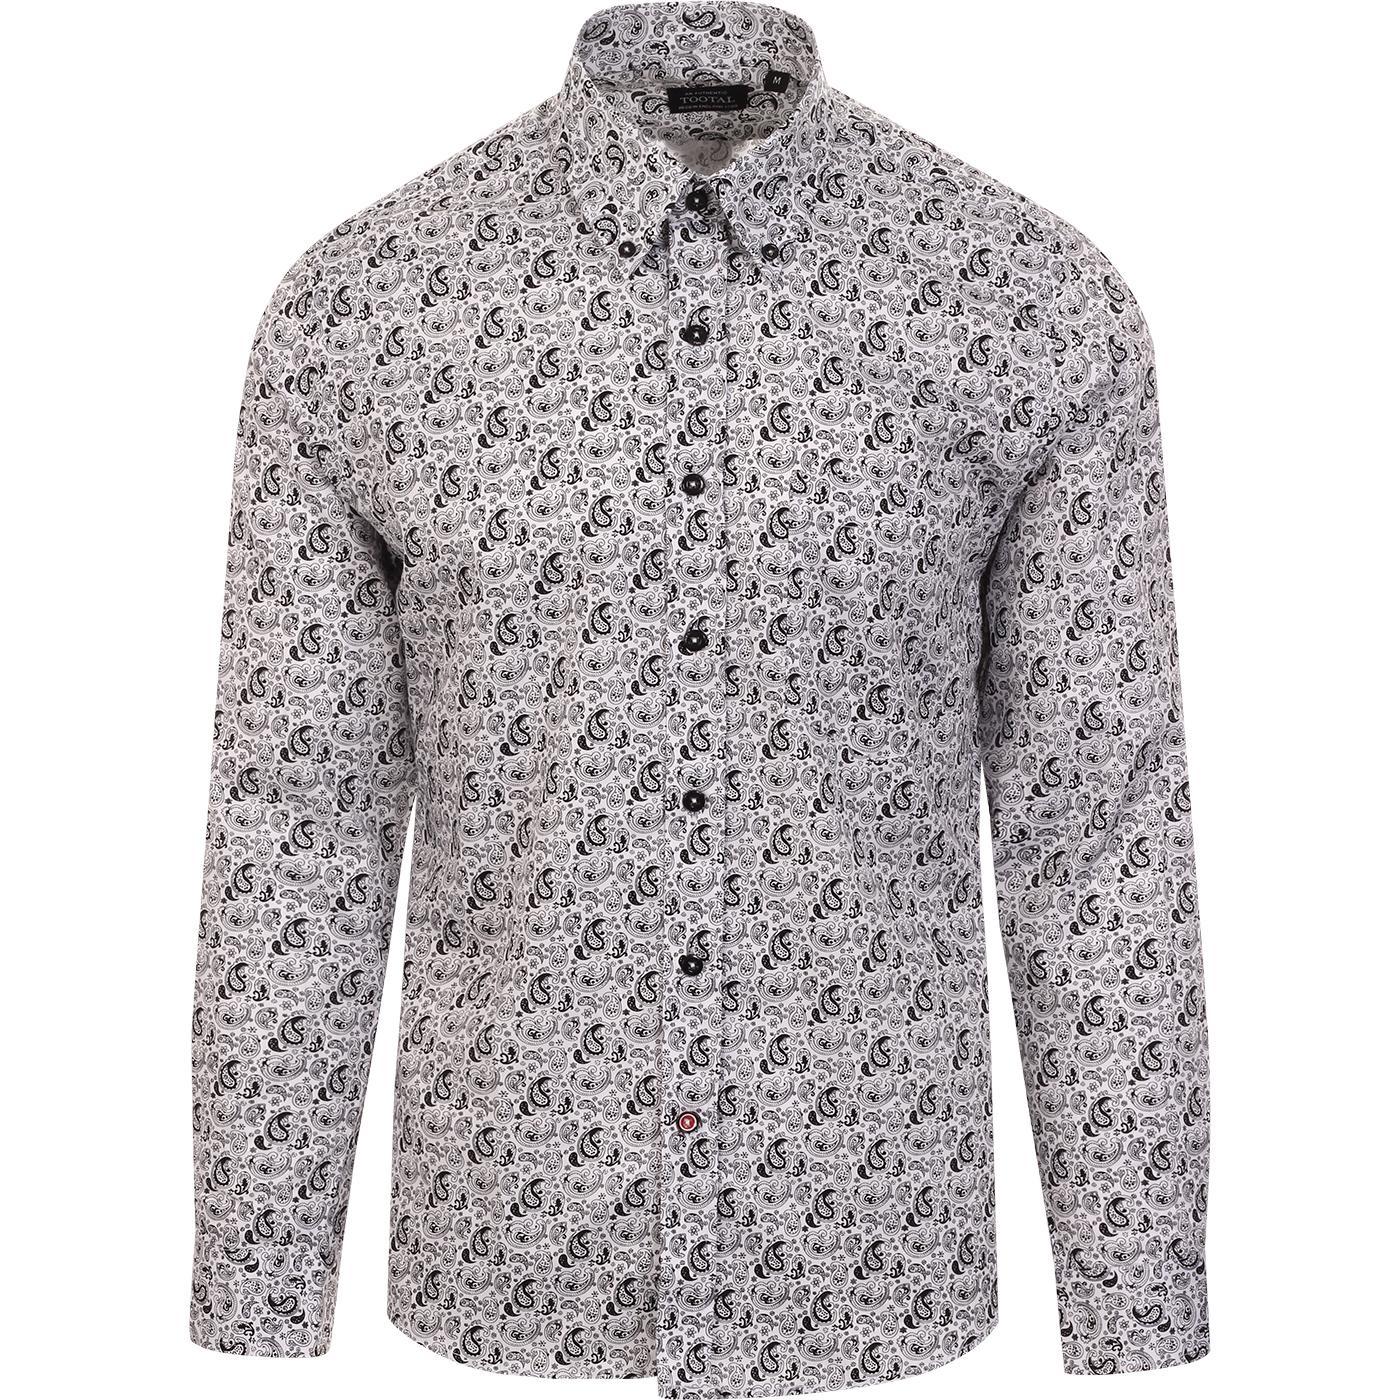 TOOTAL 60s Mod Paisley LS Button Down Shirt (W/B)